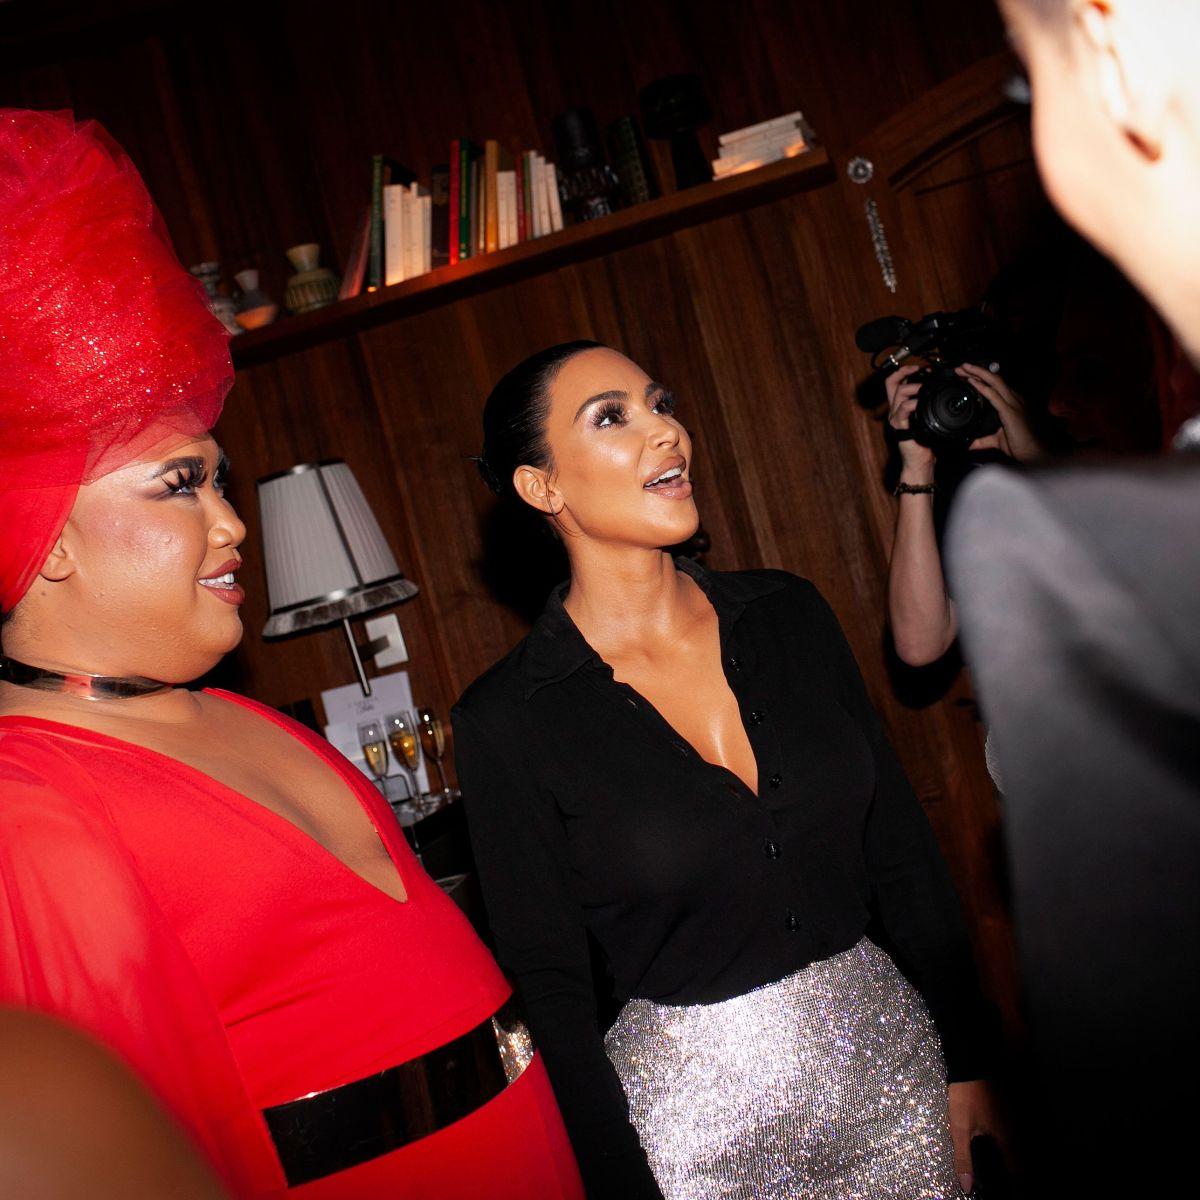 Kim Kardashian and Paris Hilton Reunite at KKW Beauty x Winnie Harlow Dinner in NYC